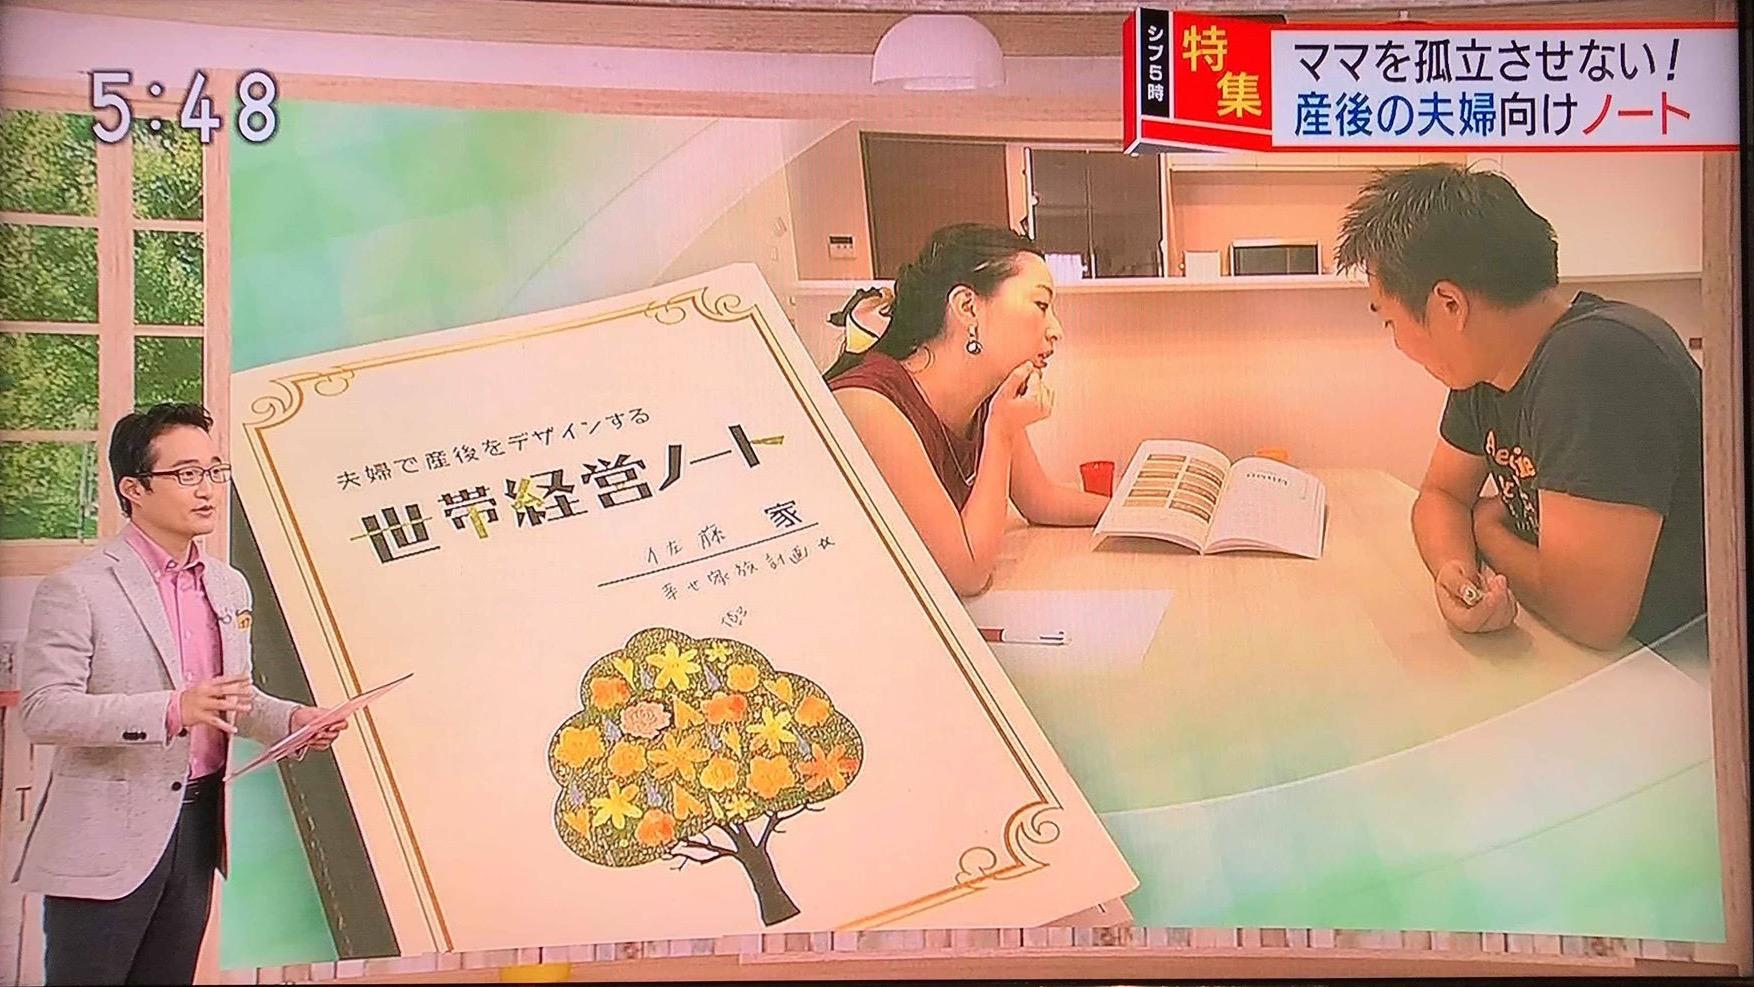 NHK全国「ニュース シブ5時」産後うつ特集で夫婦会議ツール「世帯経営ノート」をご紹介いただきました